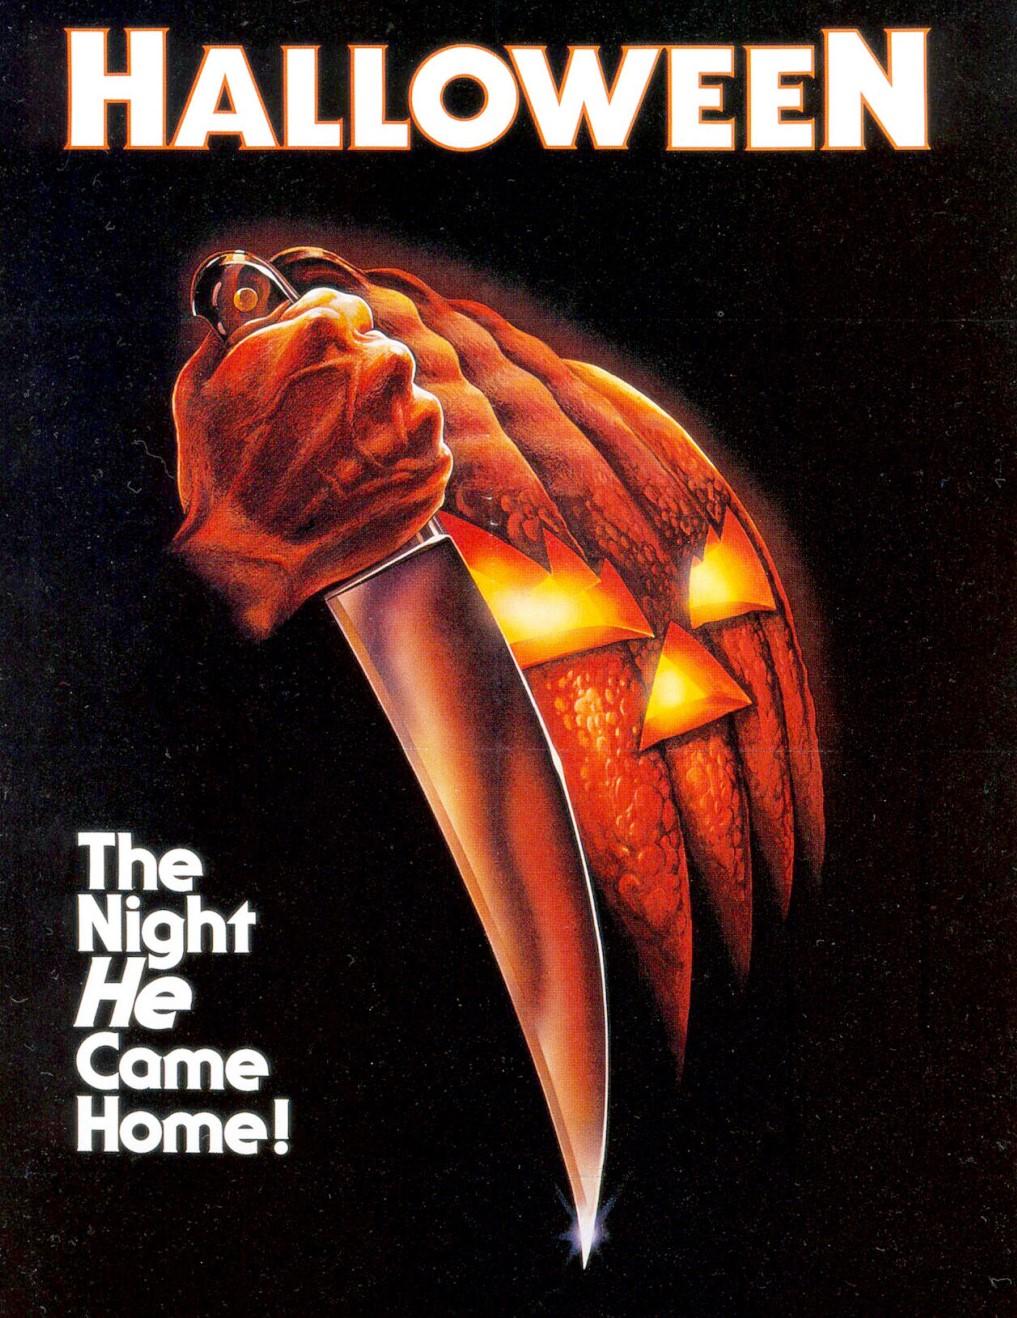 Halloween (1978), directed by John Carpenter